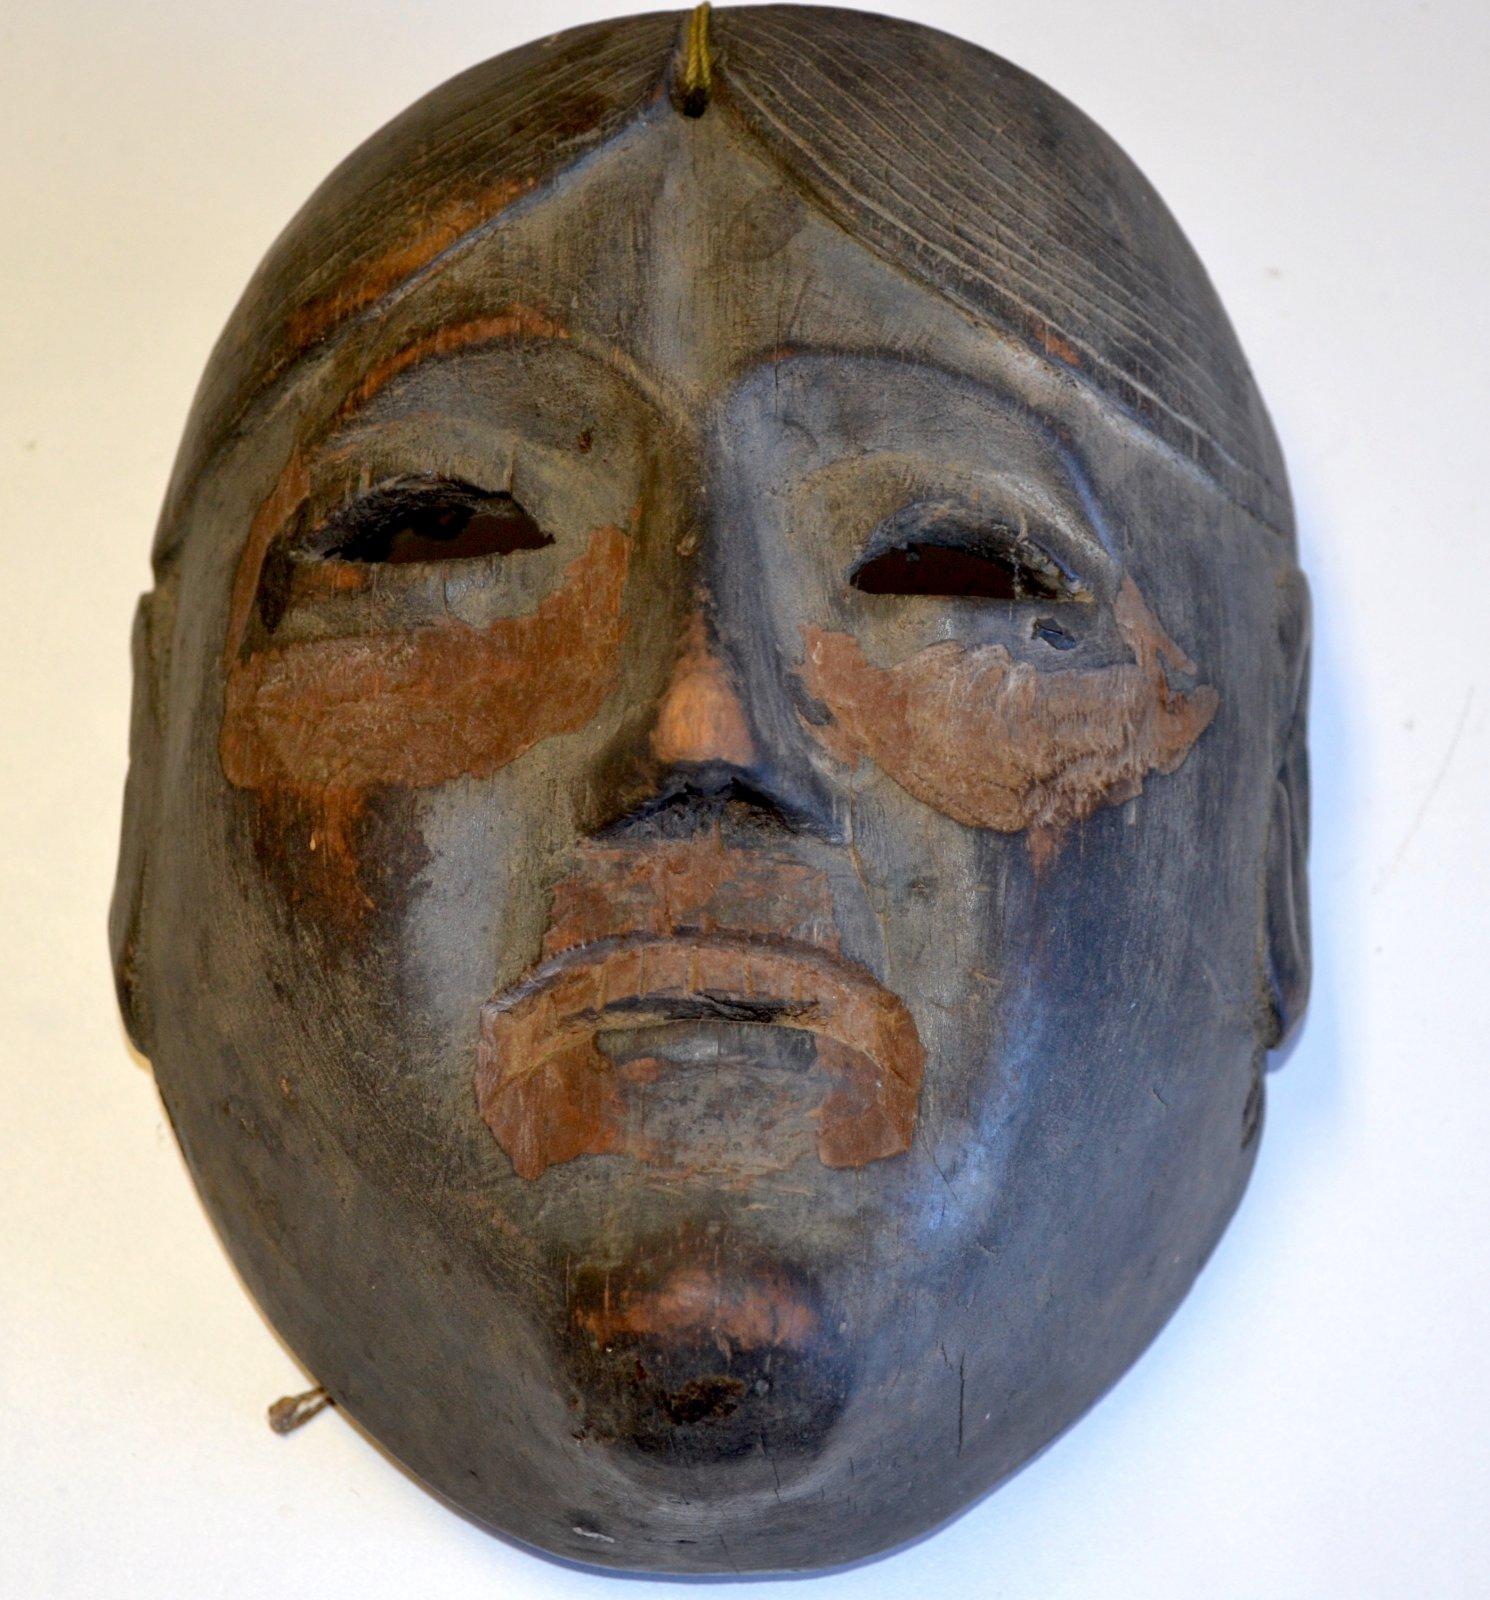 Central American, Guatemala/ Mayan Patron mask from the Patzcar dance